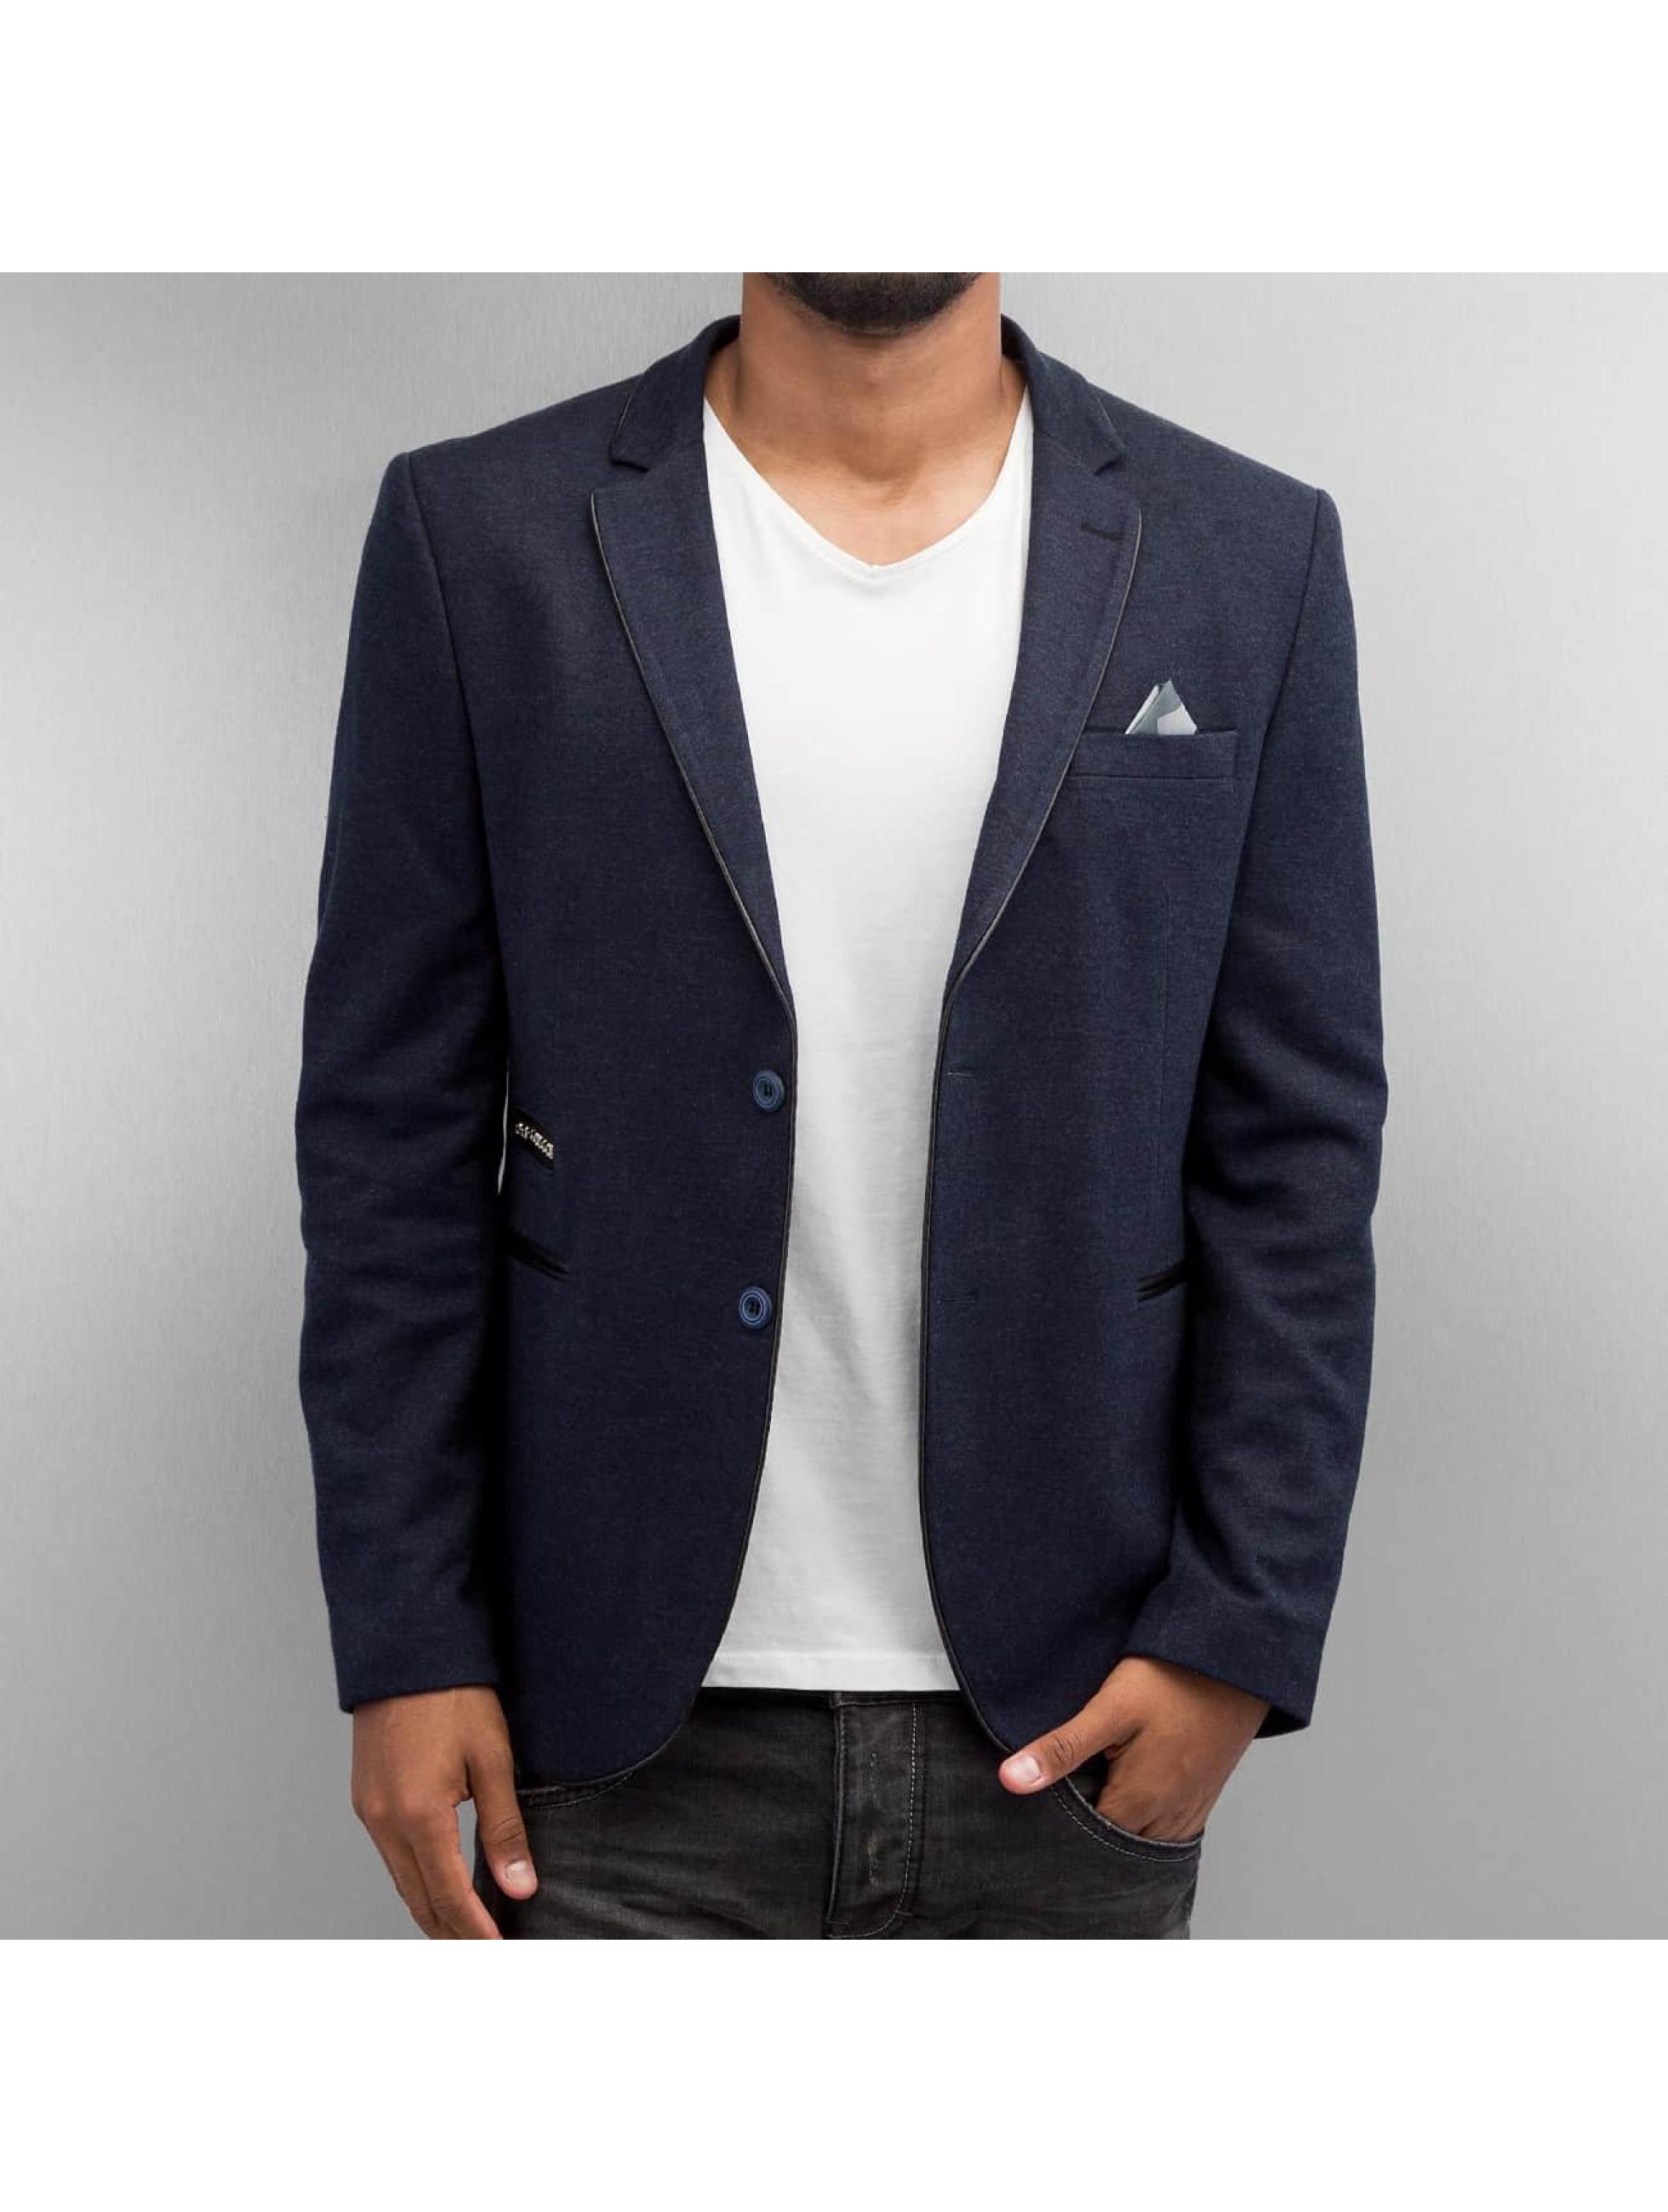 Mantel/Sakko Soft in blau